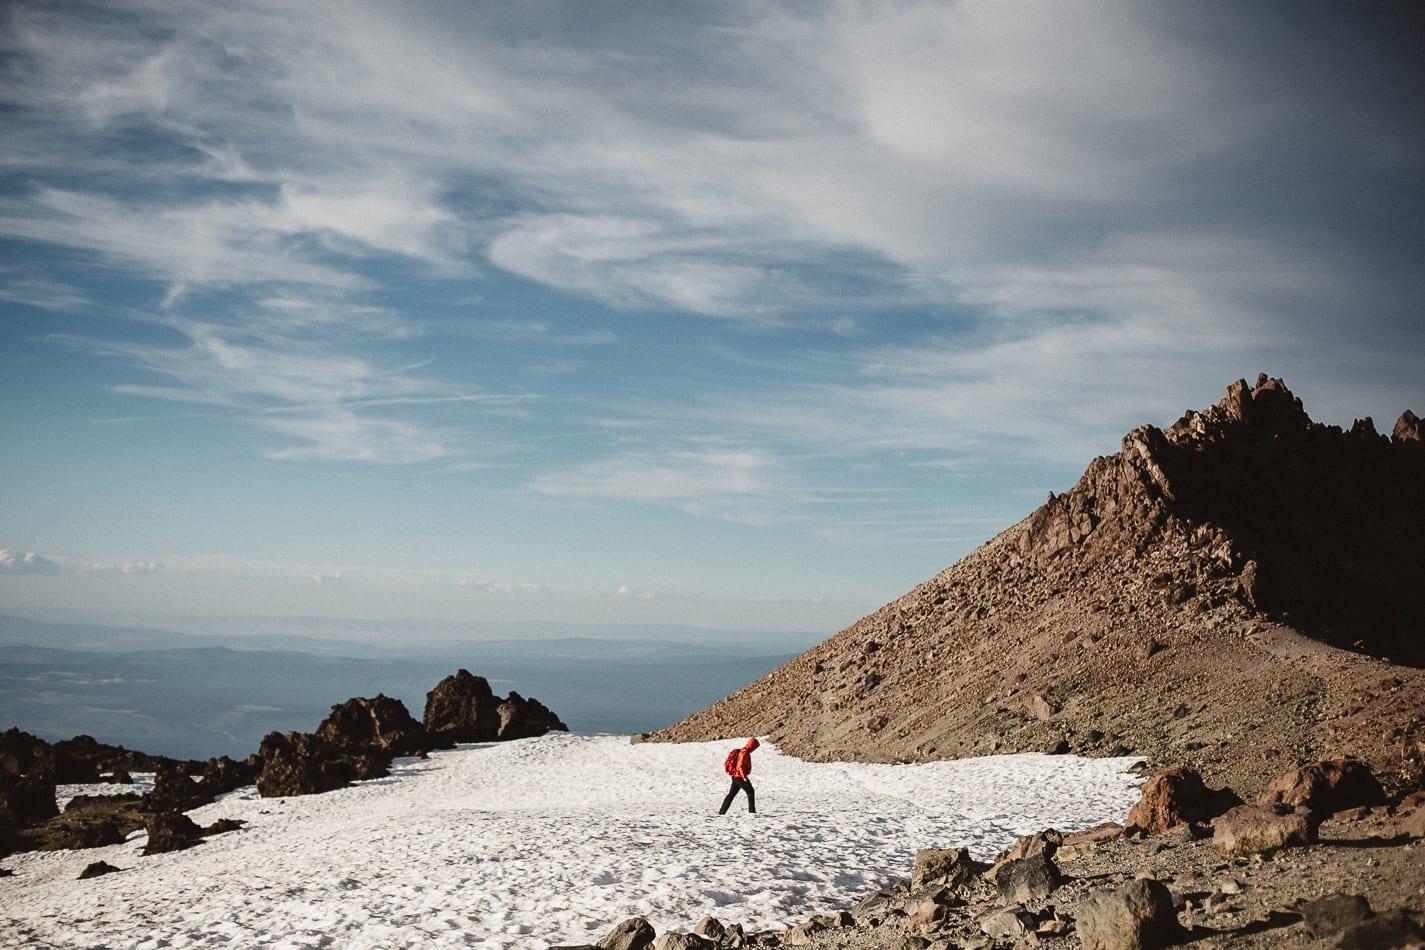 mount-lassen-california-adventure-lifestyle-photorapher-31